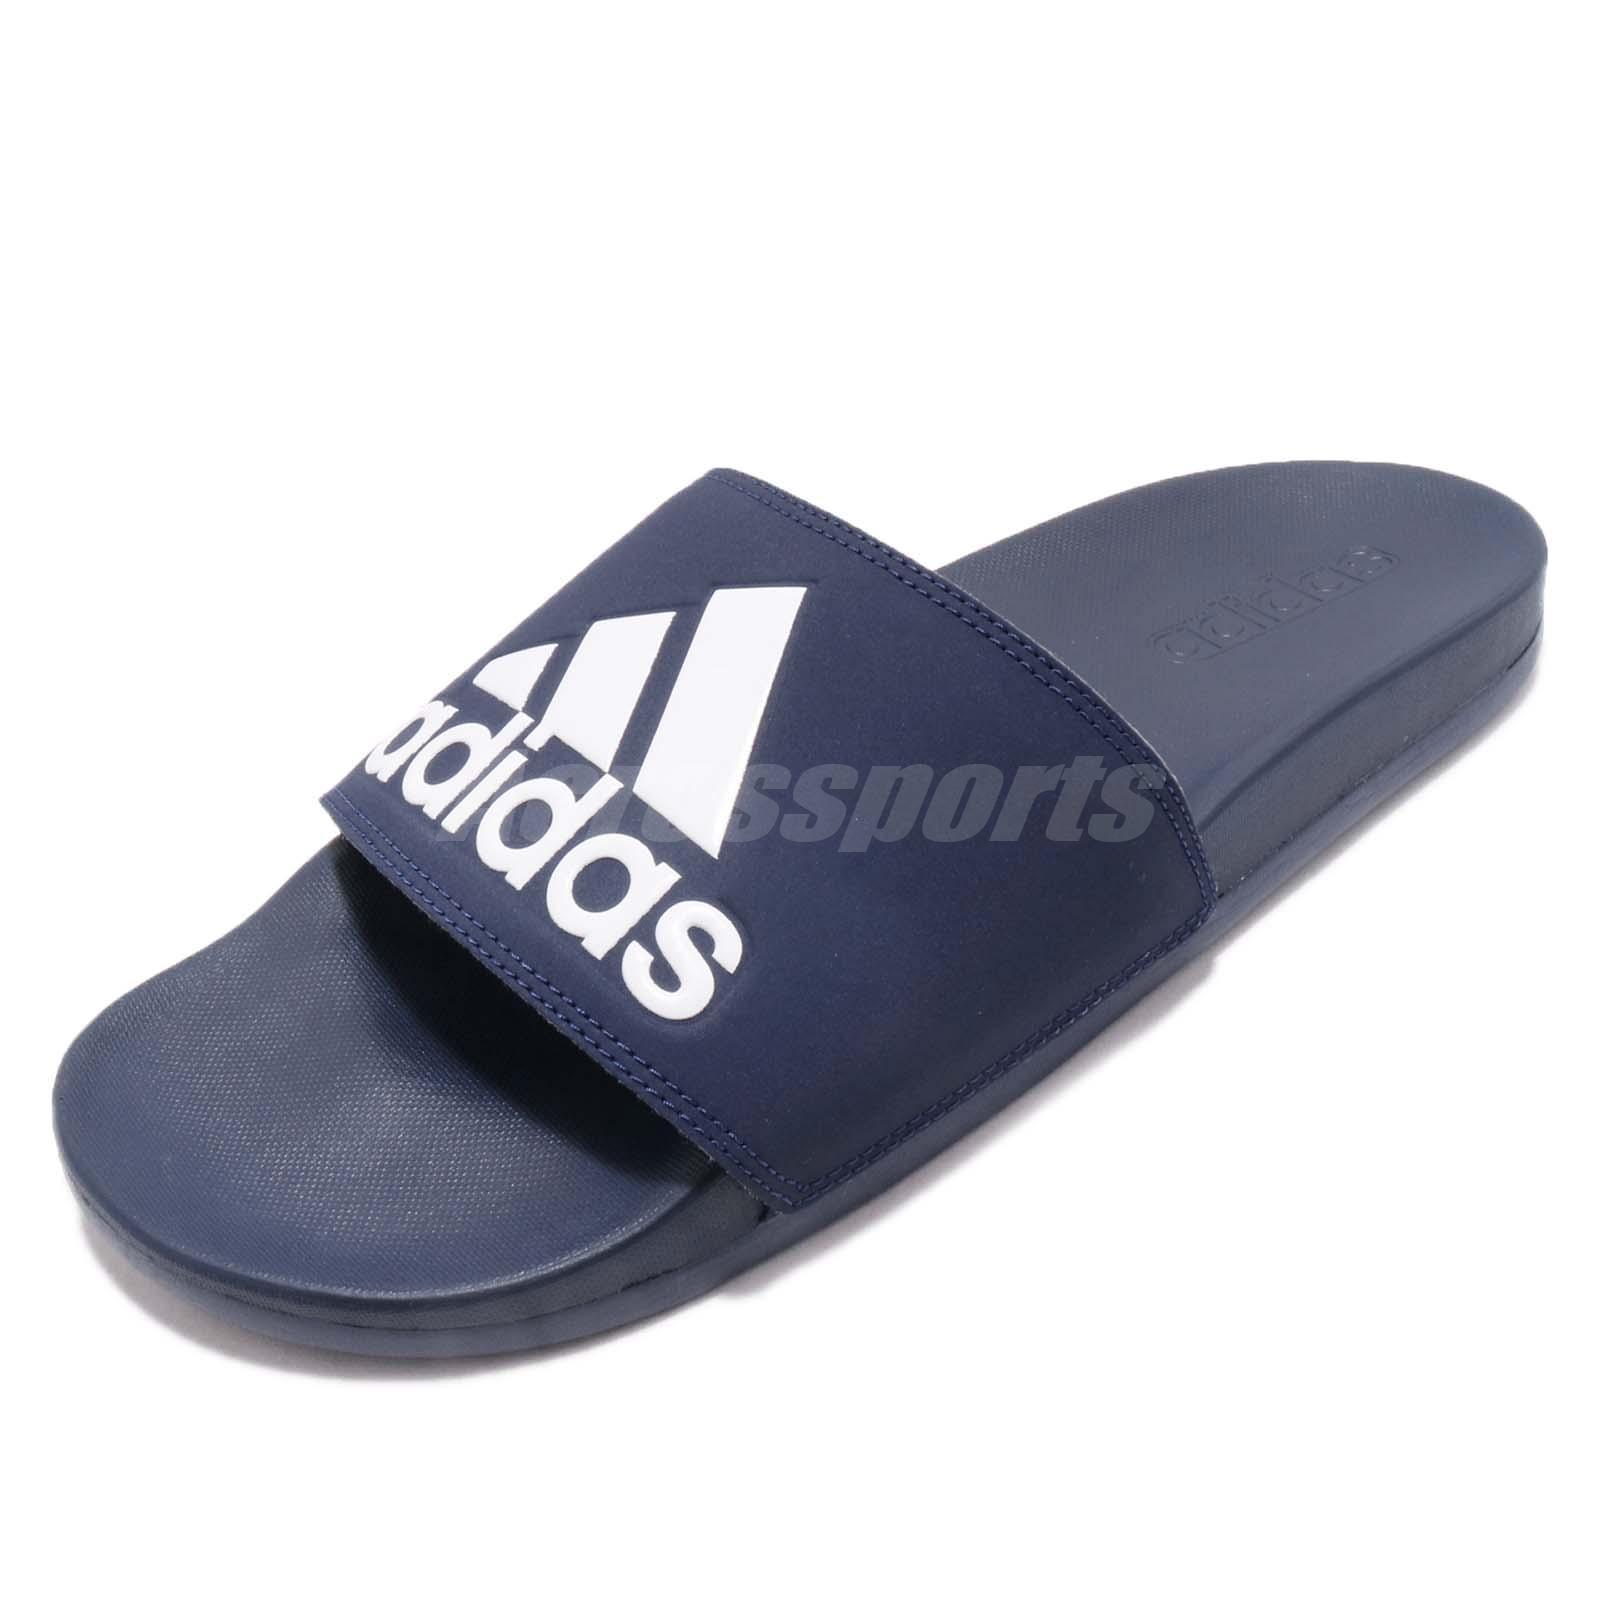 9c210e3c500968 adidas Adilette Cloudfoam Plus Logo Slides Dark Blue Men Sports Sandals  B44870